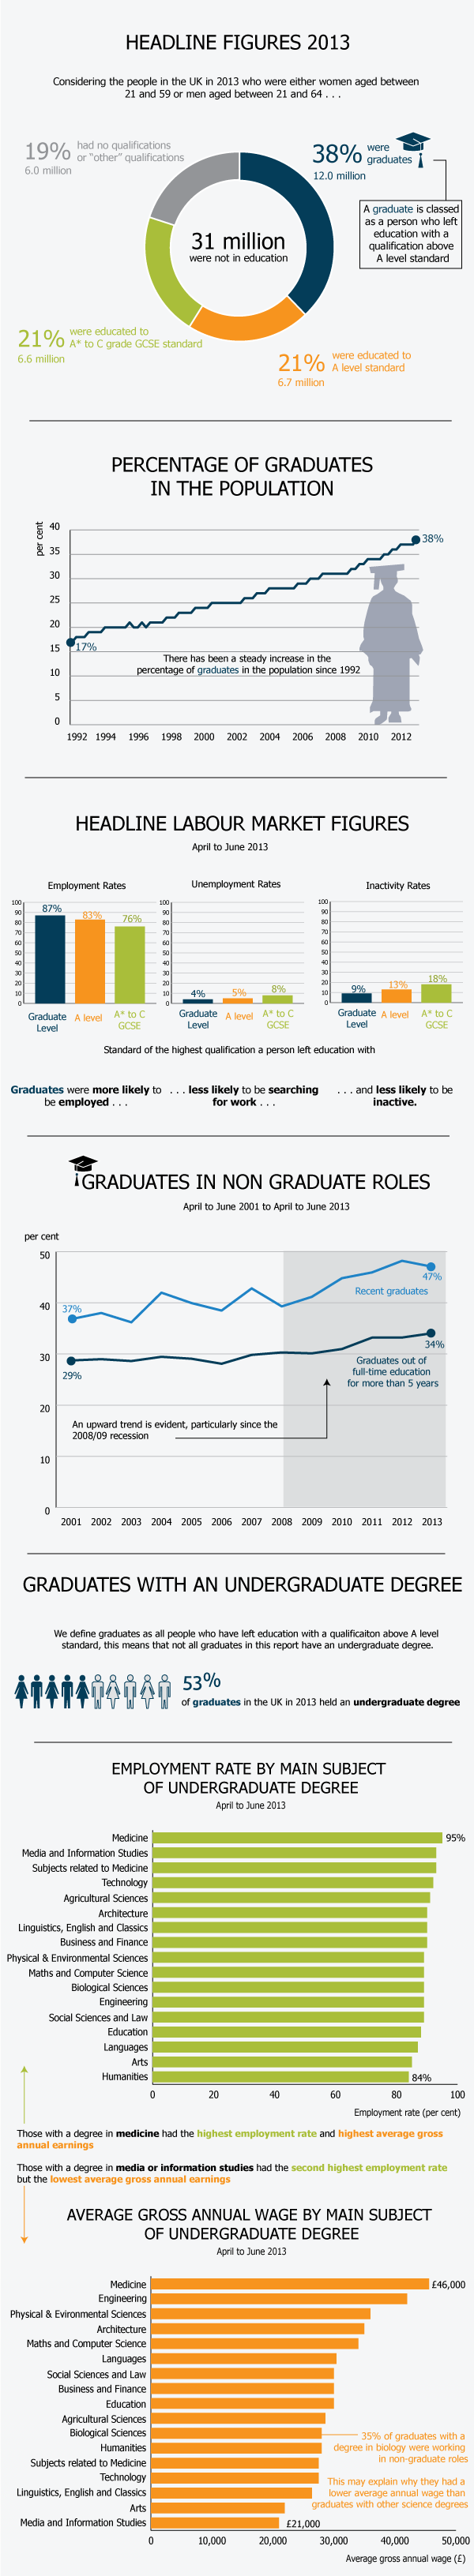 Dartmouth dissertation fellowship